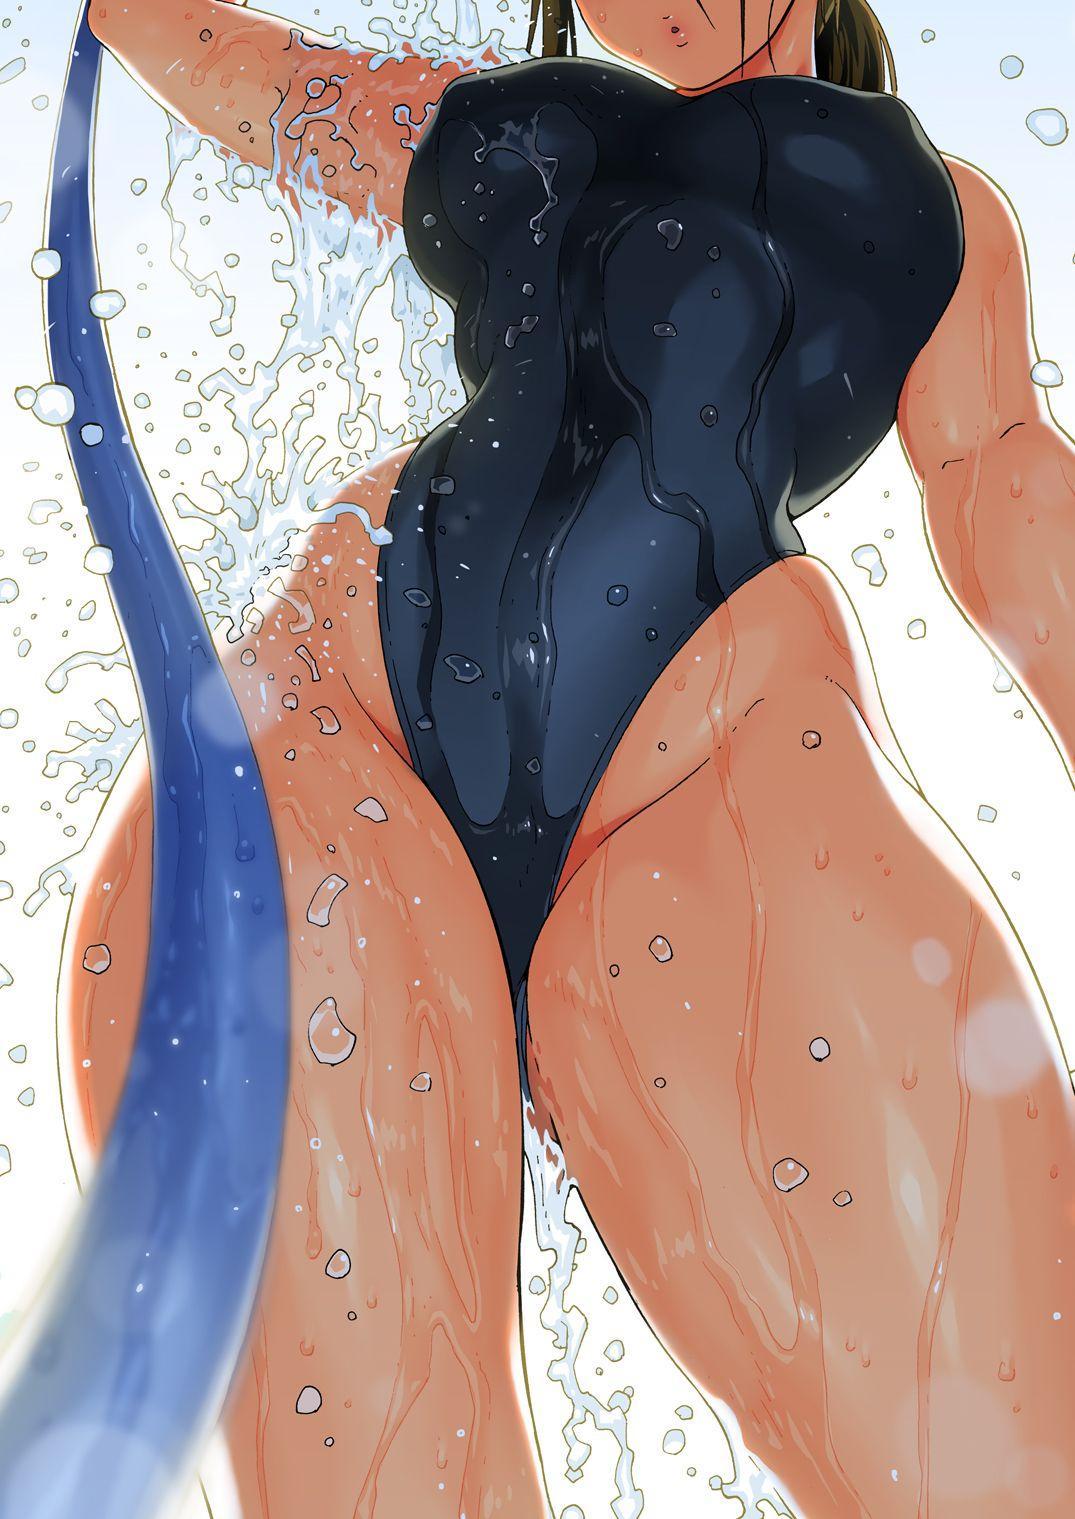 [Amazake Hatosyo-ten (Yoshu Ohepe)] Aah~ Hayaku H Shitai!! (Kana-san wa Pool no Kanshiin) | I Wanna Do Dirty Stuff Already! (Kana, the Pool Lifeguard) [English] [Rotoscopic] [Digital] 19